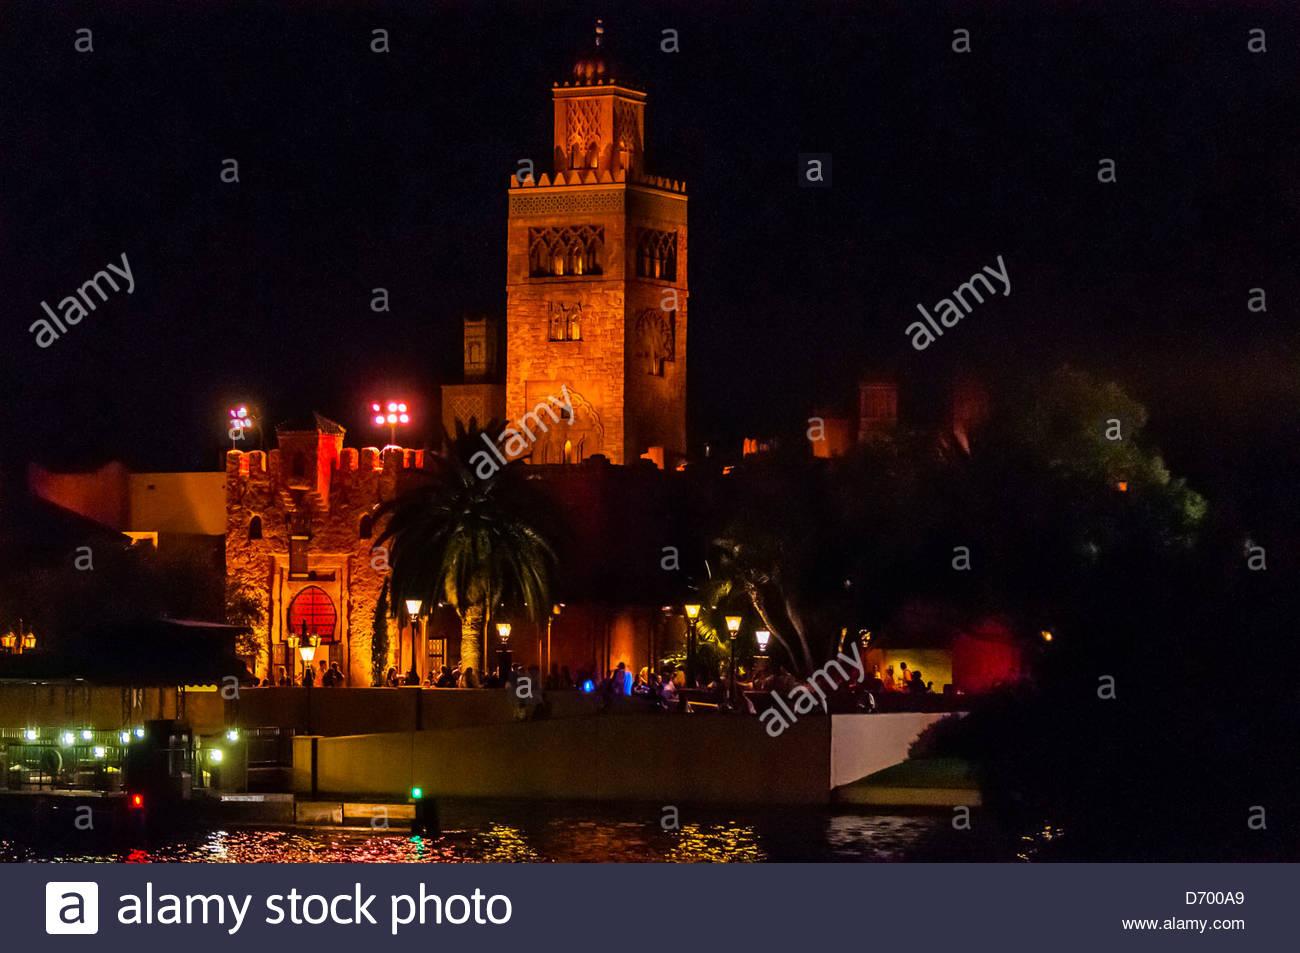 The Morocco Pavilion, World Showcase, Epcot, Walt Disney World, Orlando, Florida USA - Stock Image